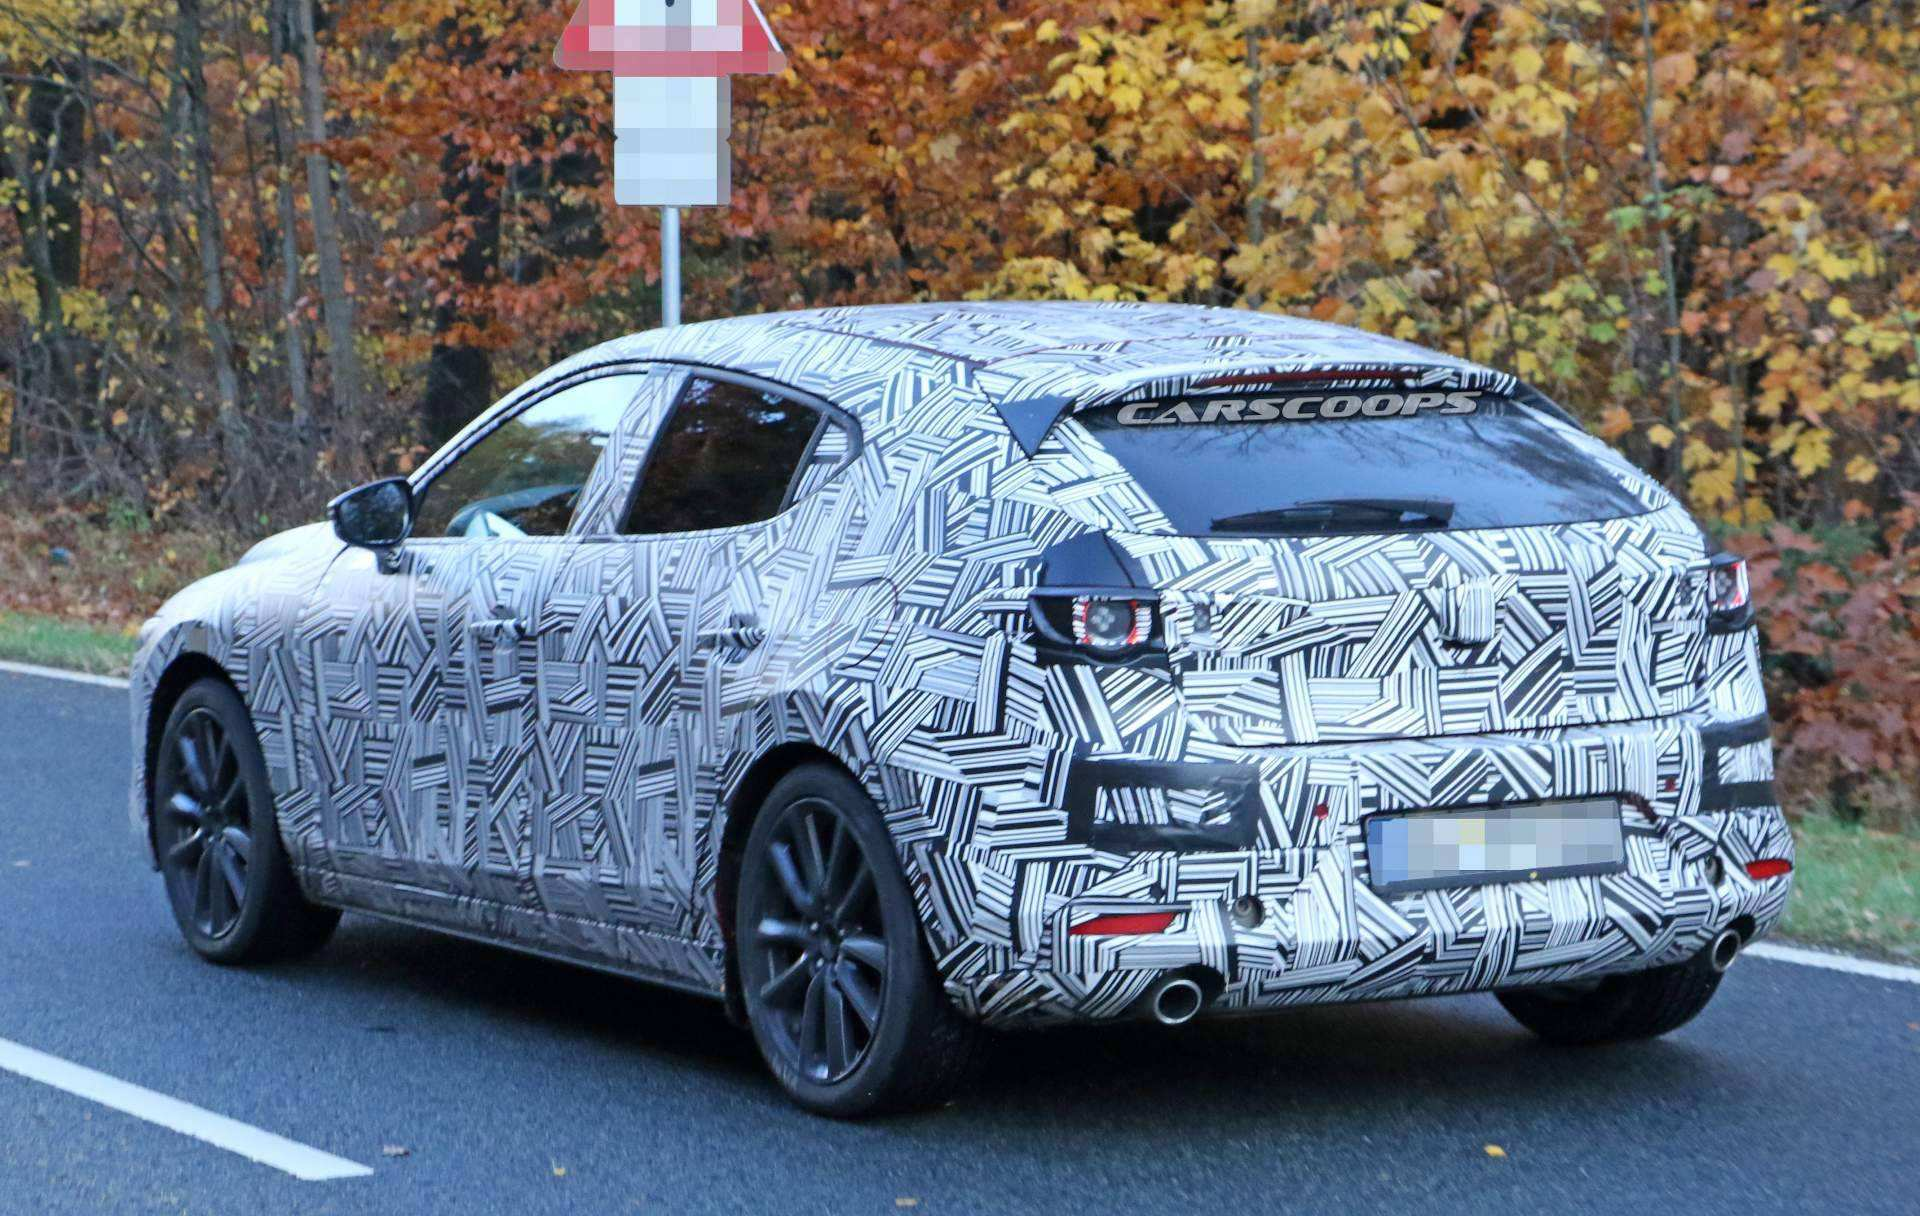 45 New New Mazda 3 2019 Spy Interior Picture with New Mazda 3 2019 Spy Interior